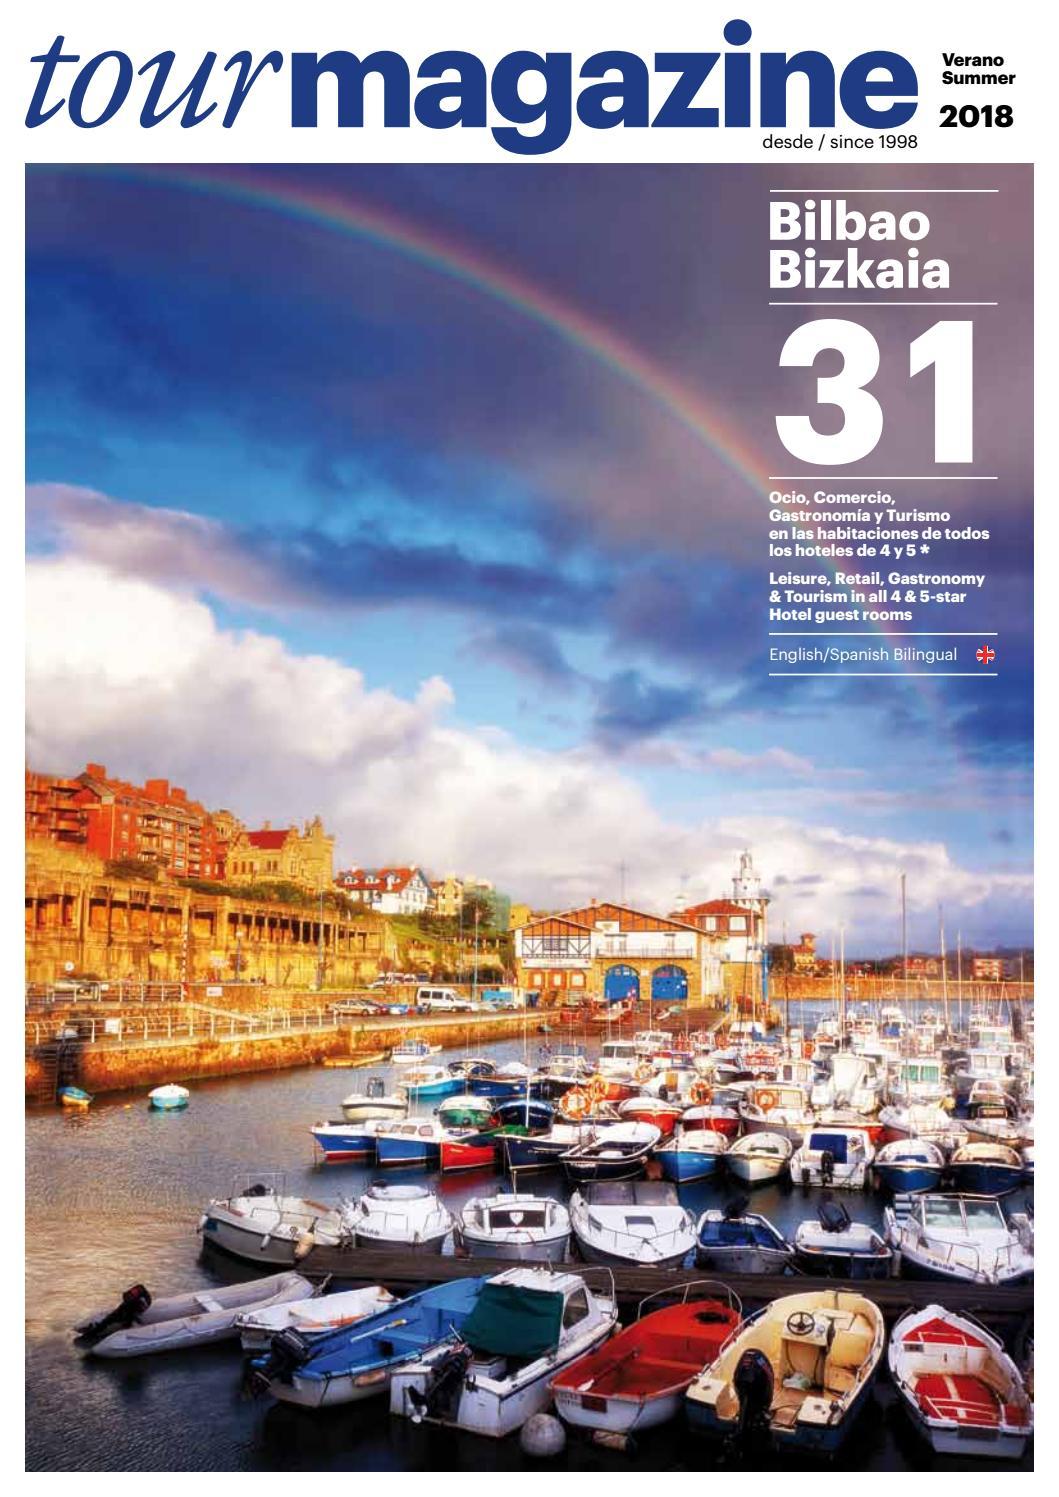 TOUR MAGAZINE BILBAO BIZKAIA Nº31 by Tour Magazine issuu